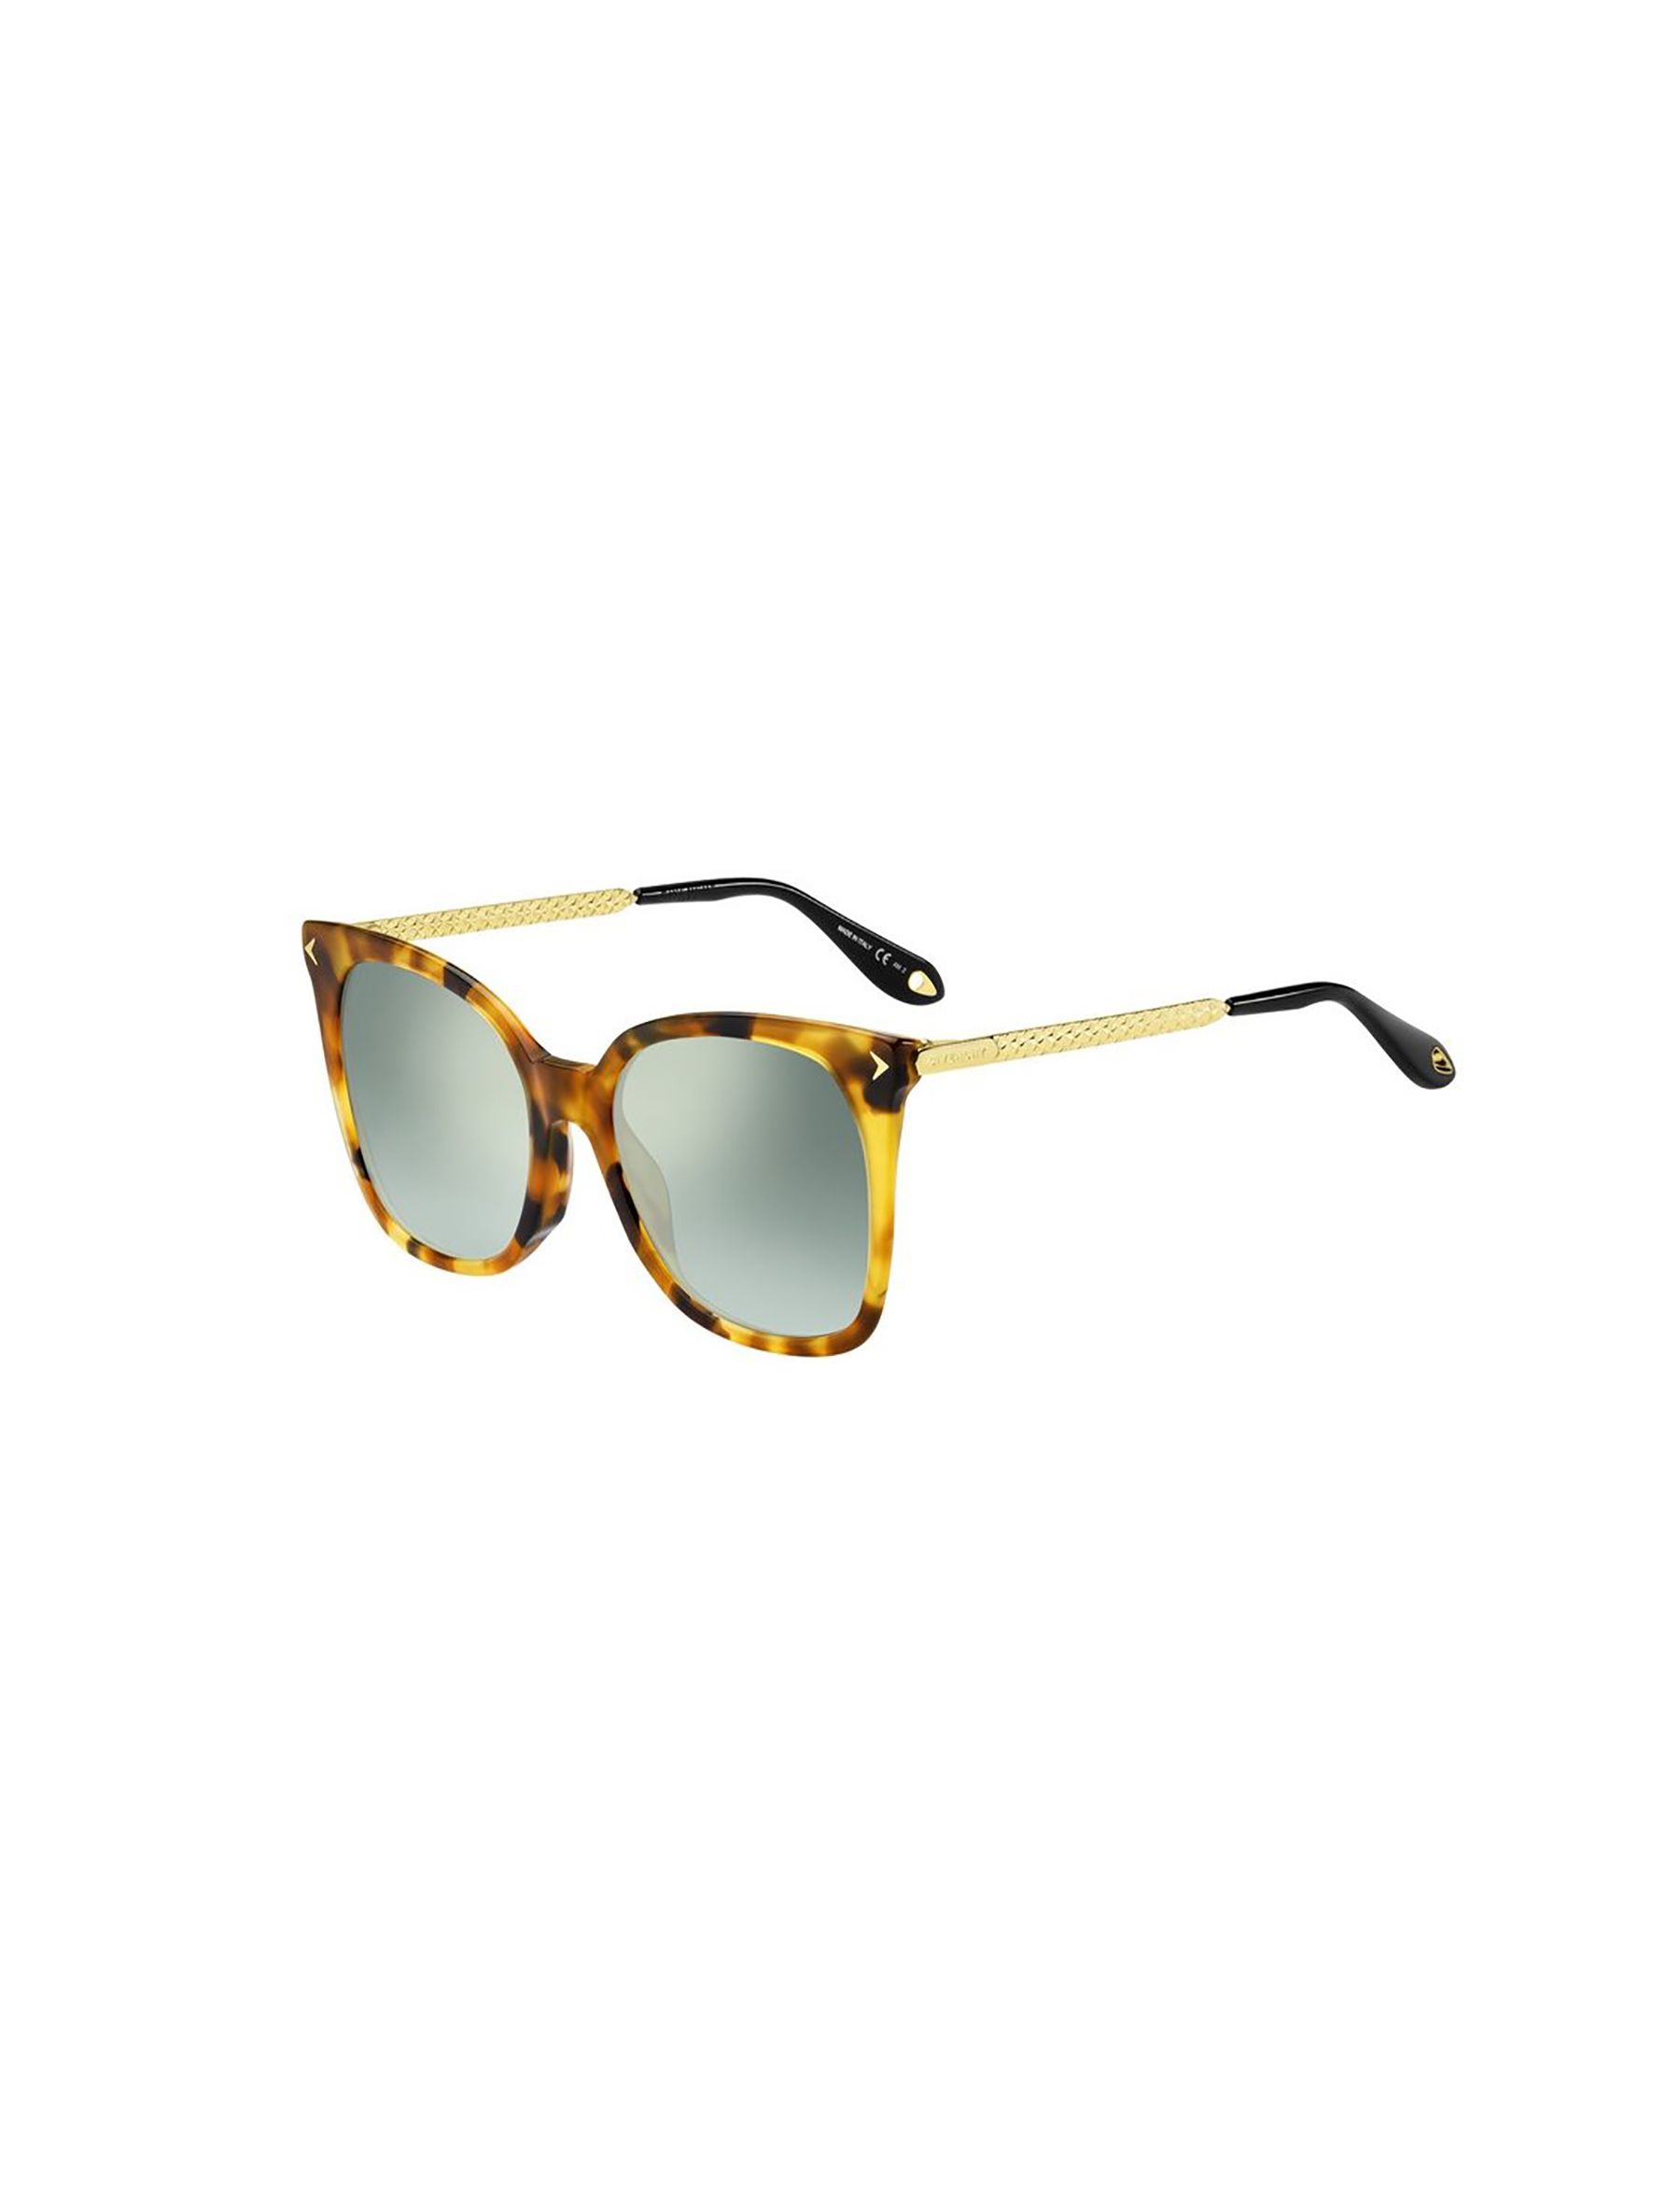 Givenchy Square Tortoise Women's Sunglasses